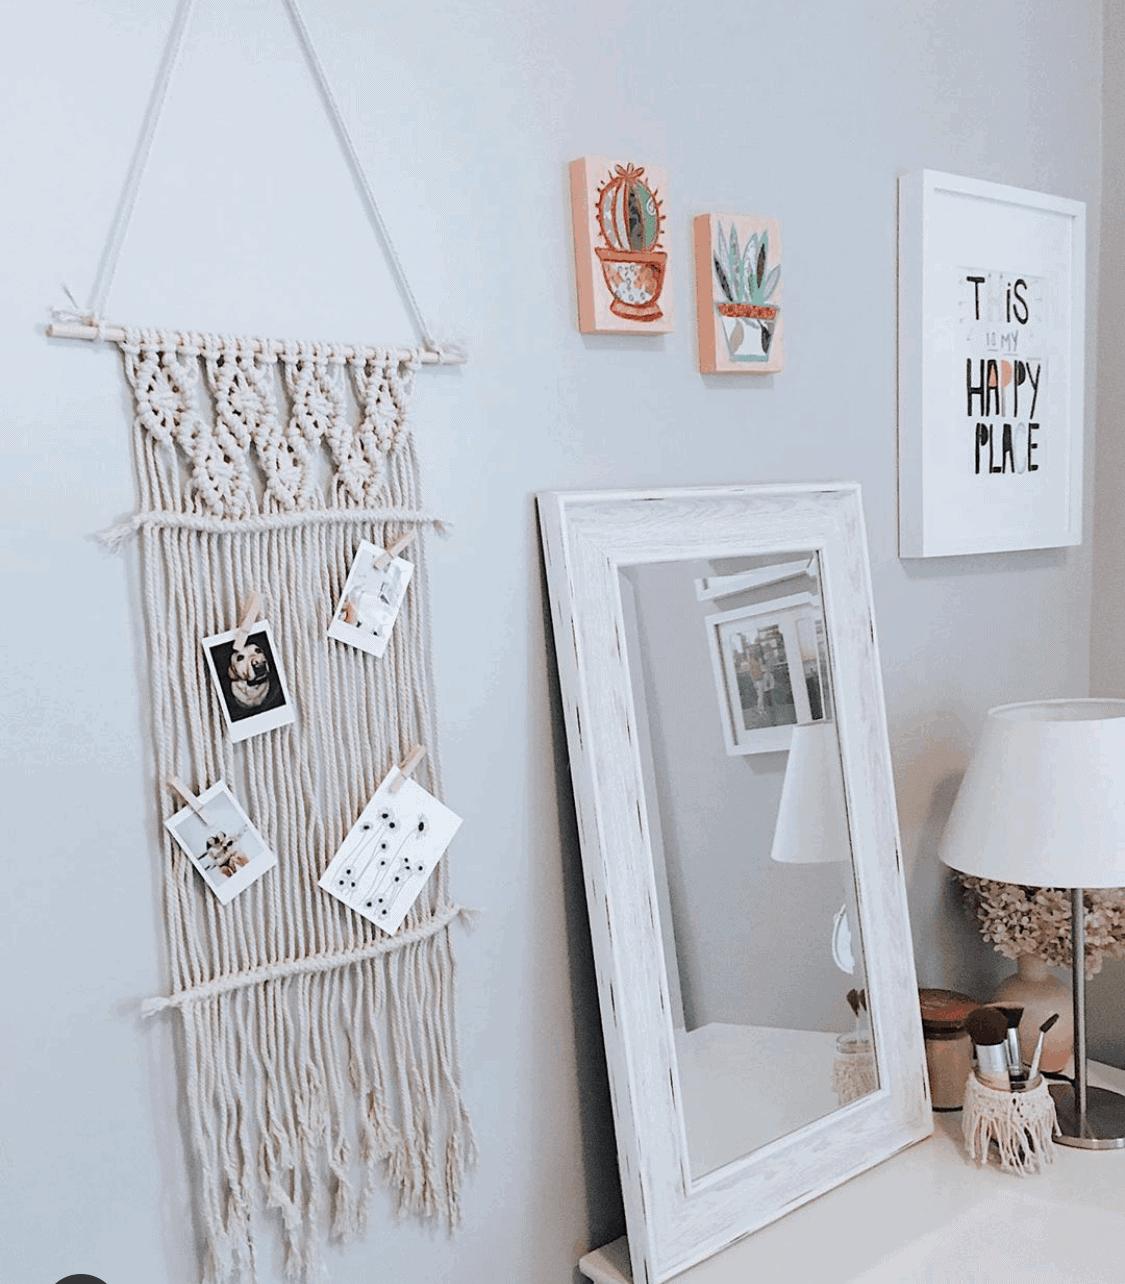 dorm-decor-ideas-wall